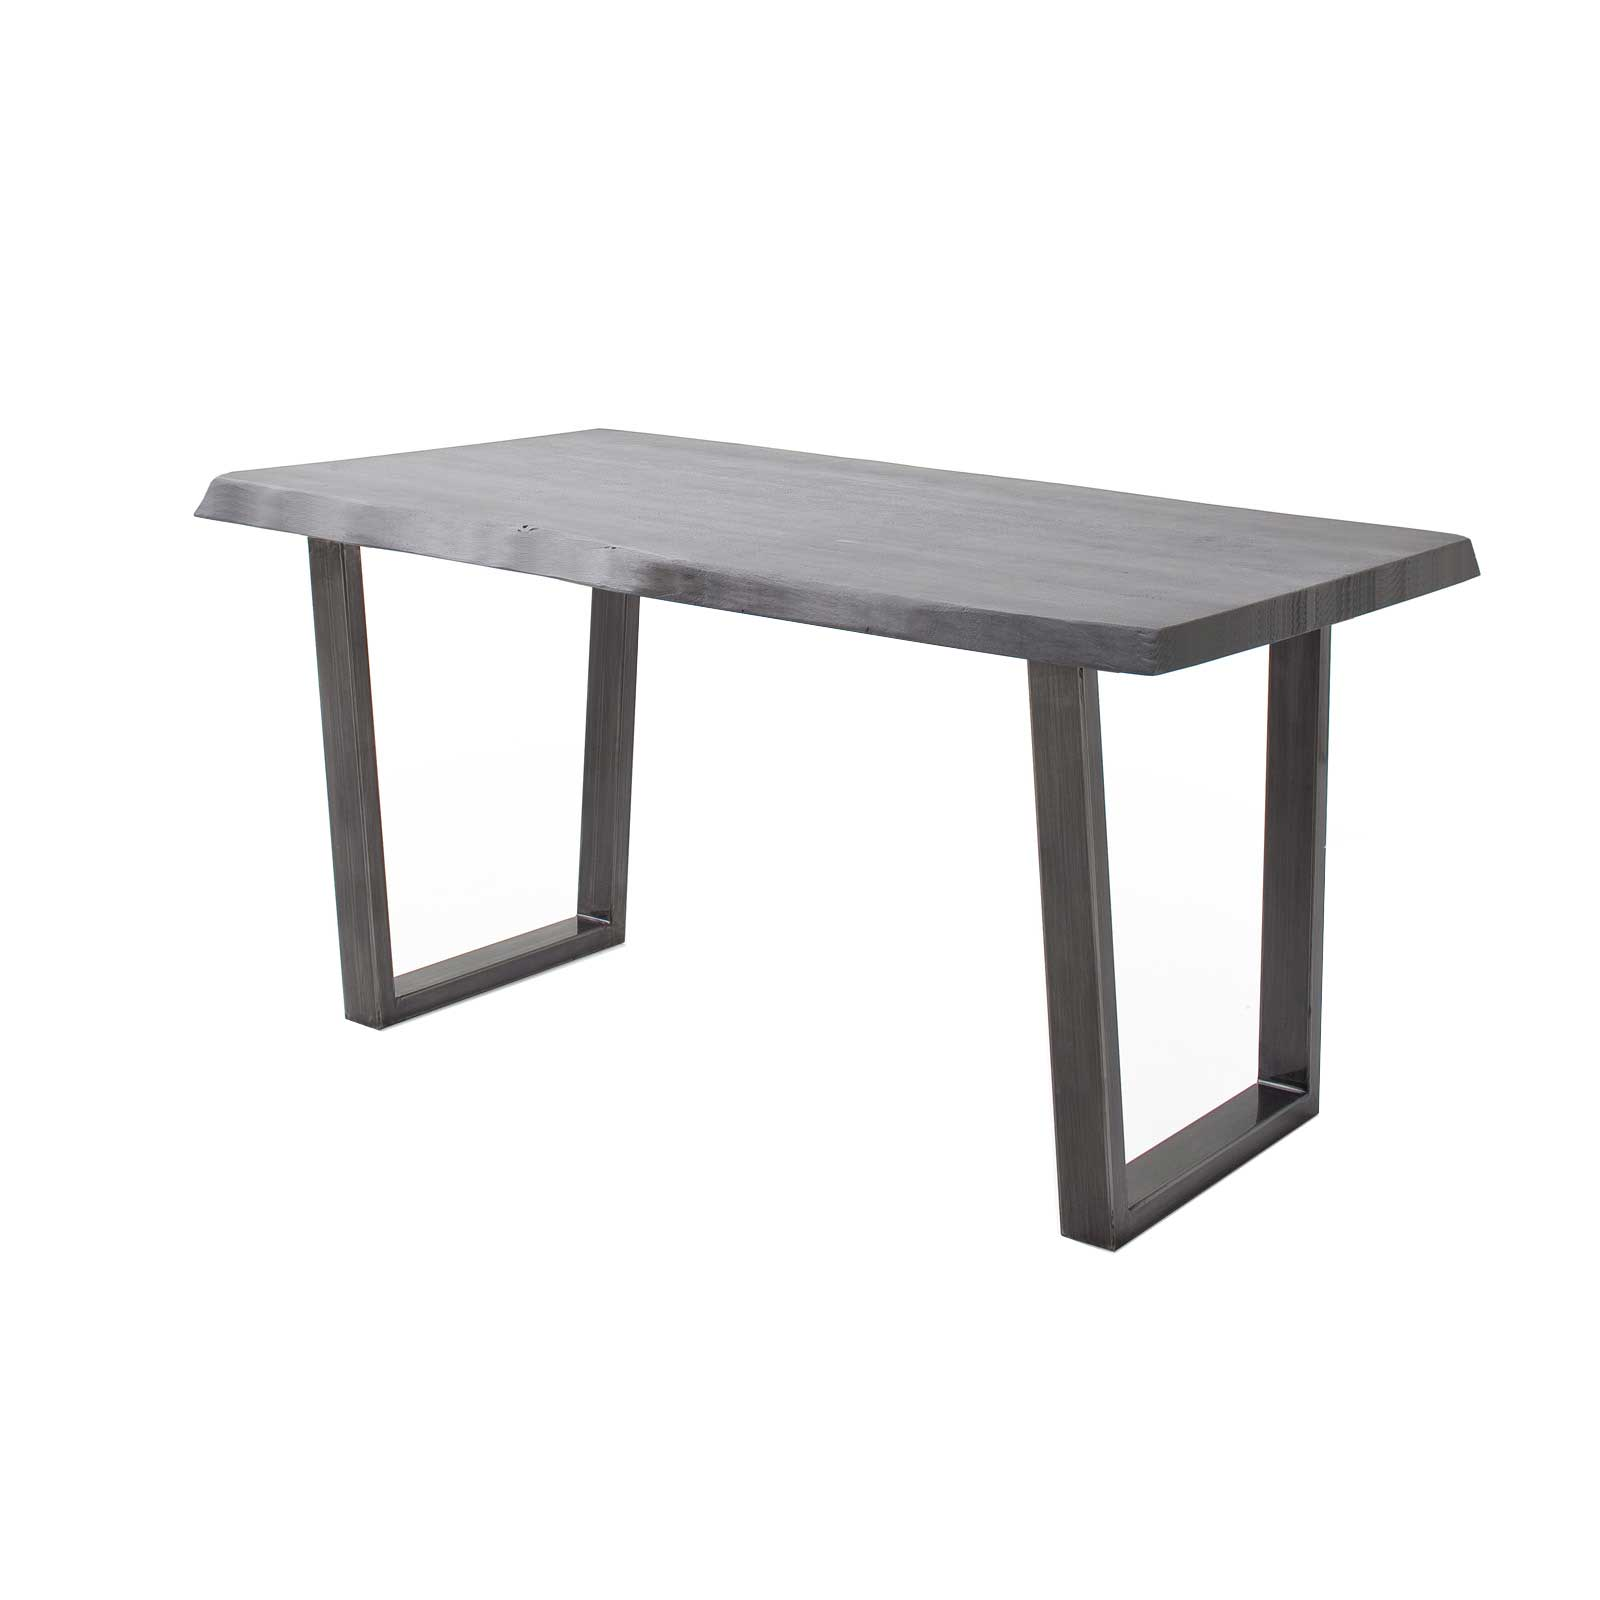 Baumtisch Oka Akazie Grau lackiert 55 mm + T Gestell Antik gewischt